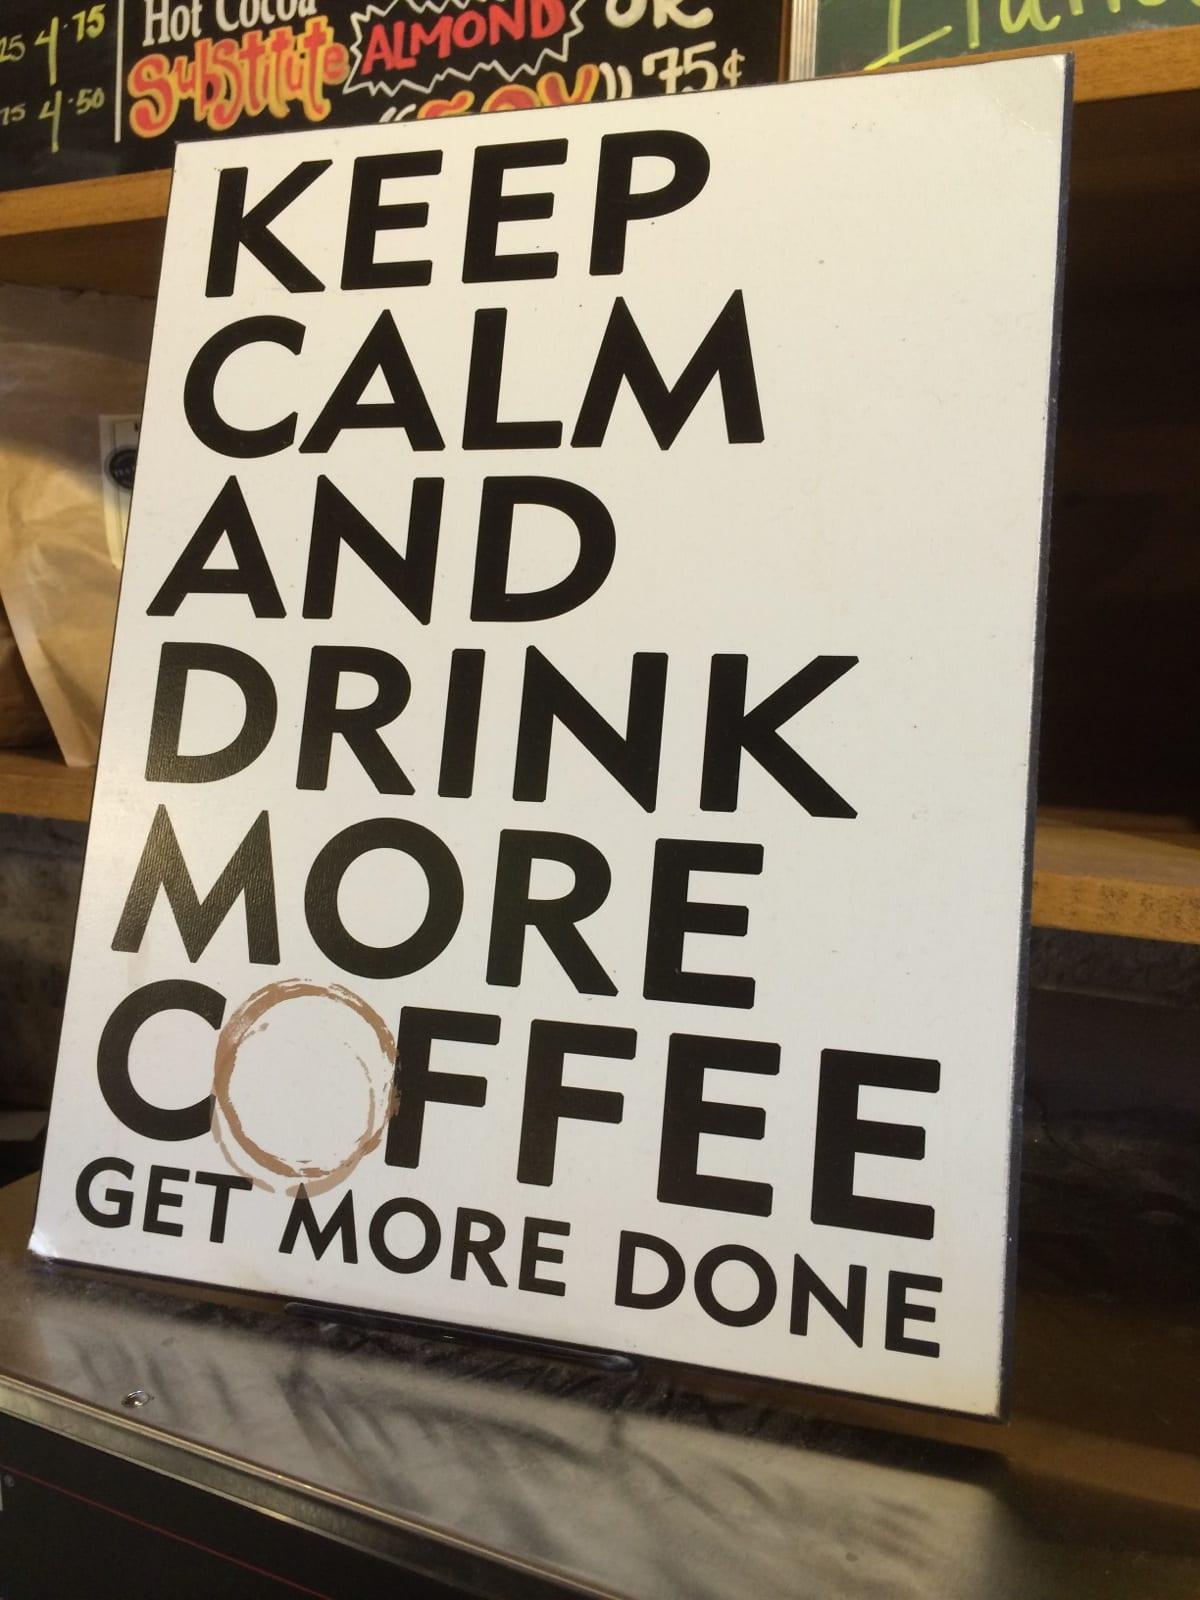 Keep calm. Drink more coffee.